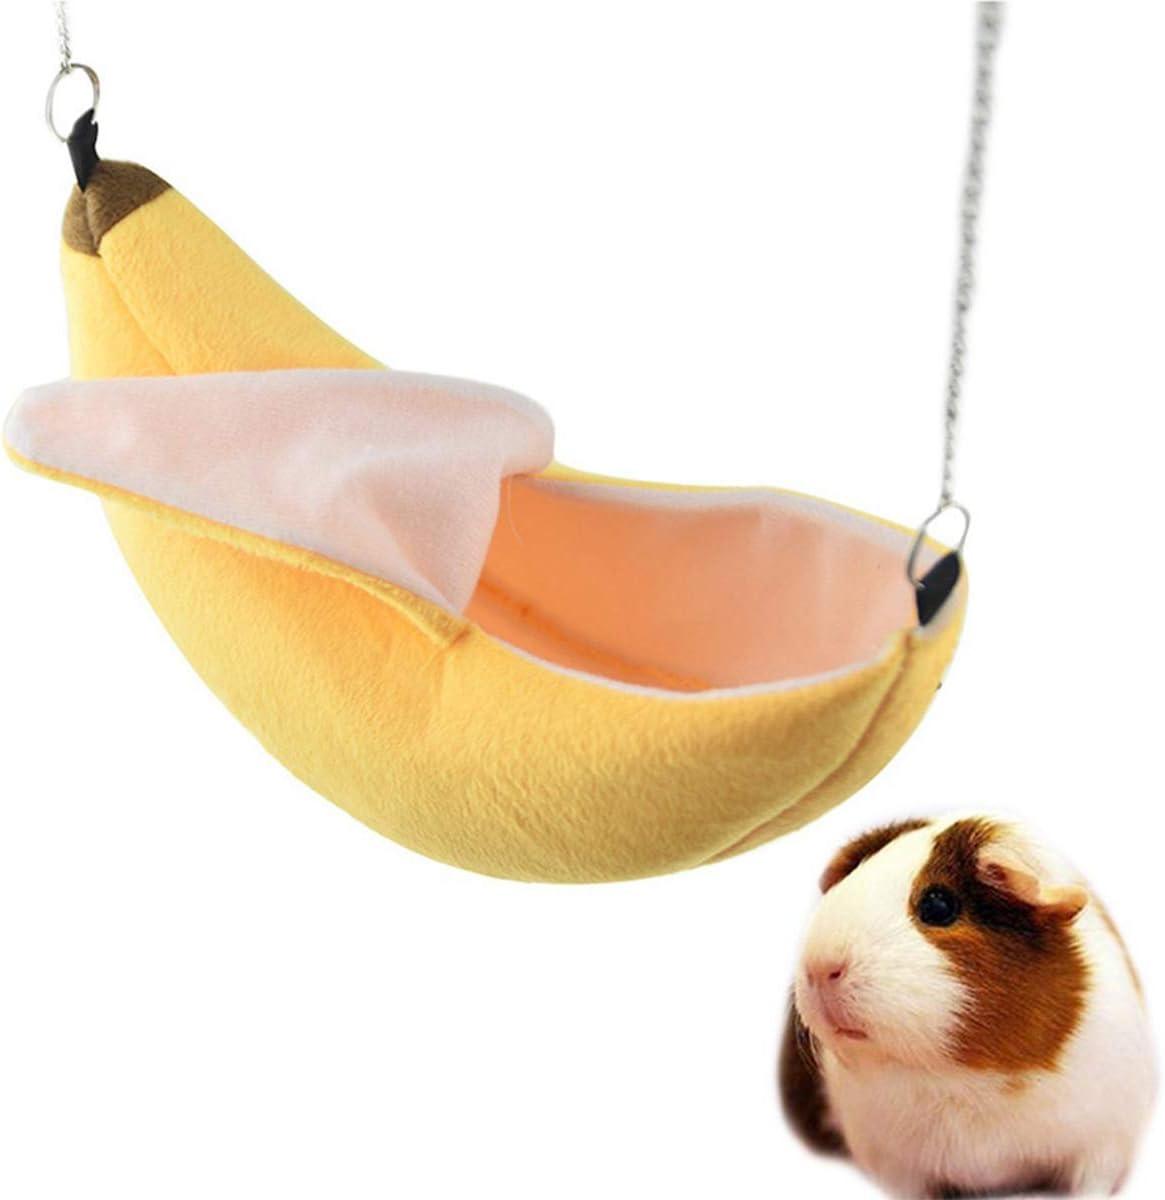 Hámster Casa Colgada Hamaca Diseño de Plátano Animales Pequeños Jaula de Algodón Dormir Nido Mascota Cama Rata Hamster Juguetes Jaula Columpio (Color : Yellow)